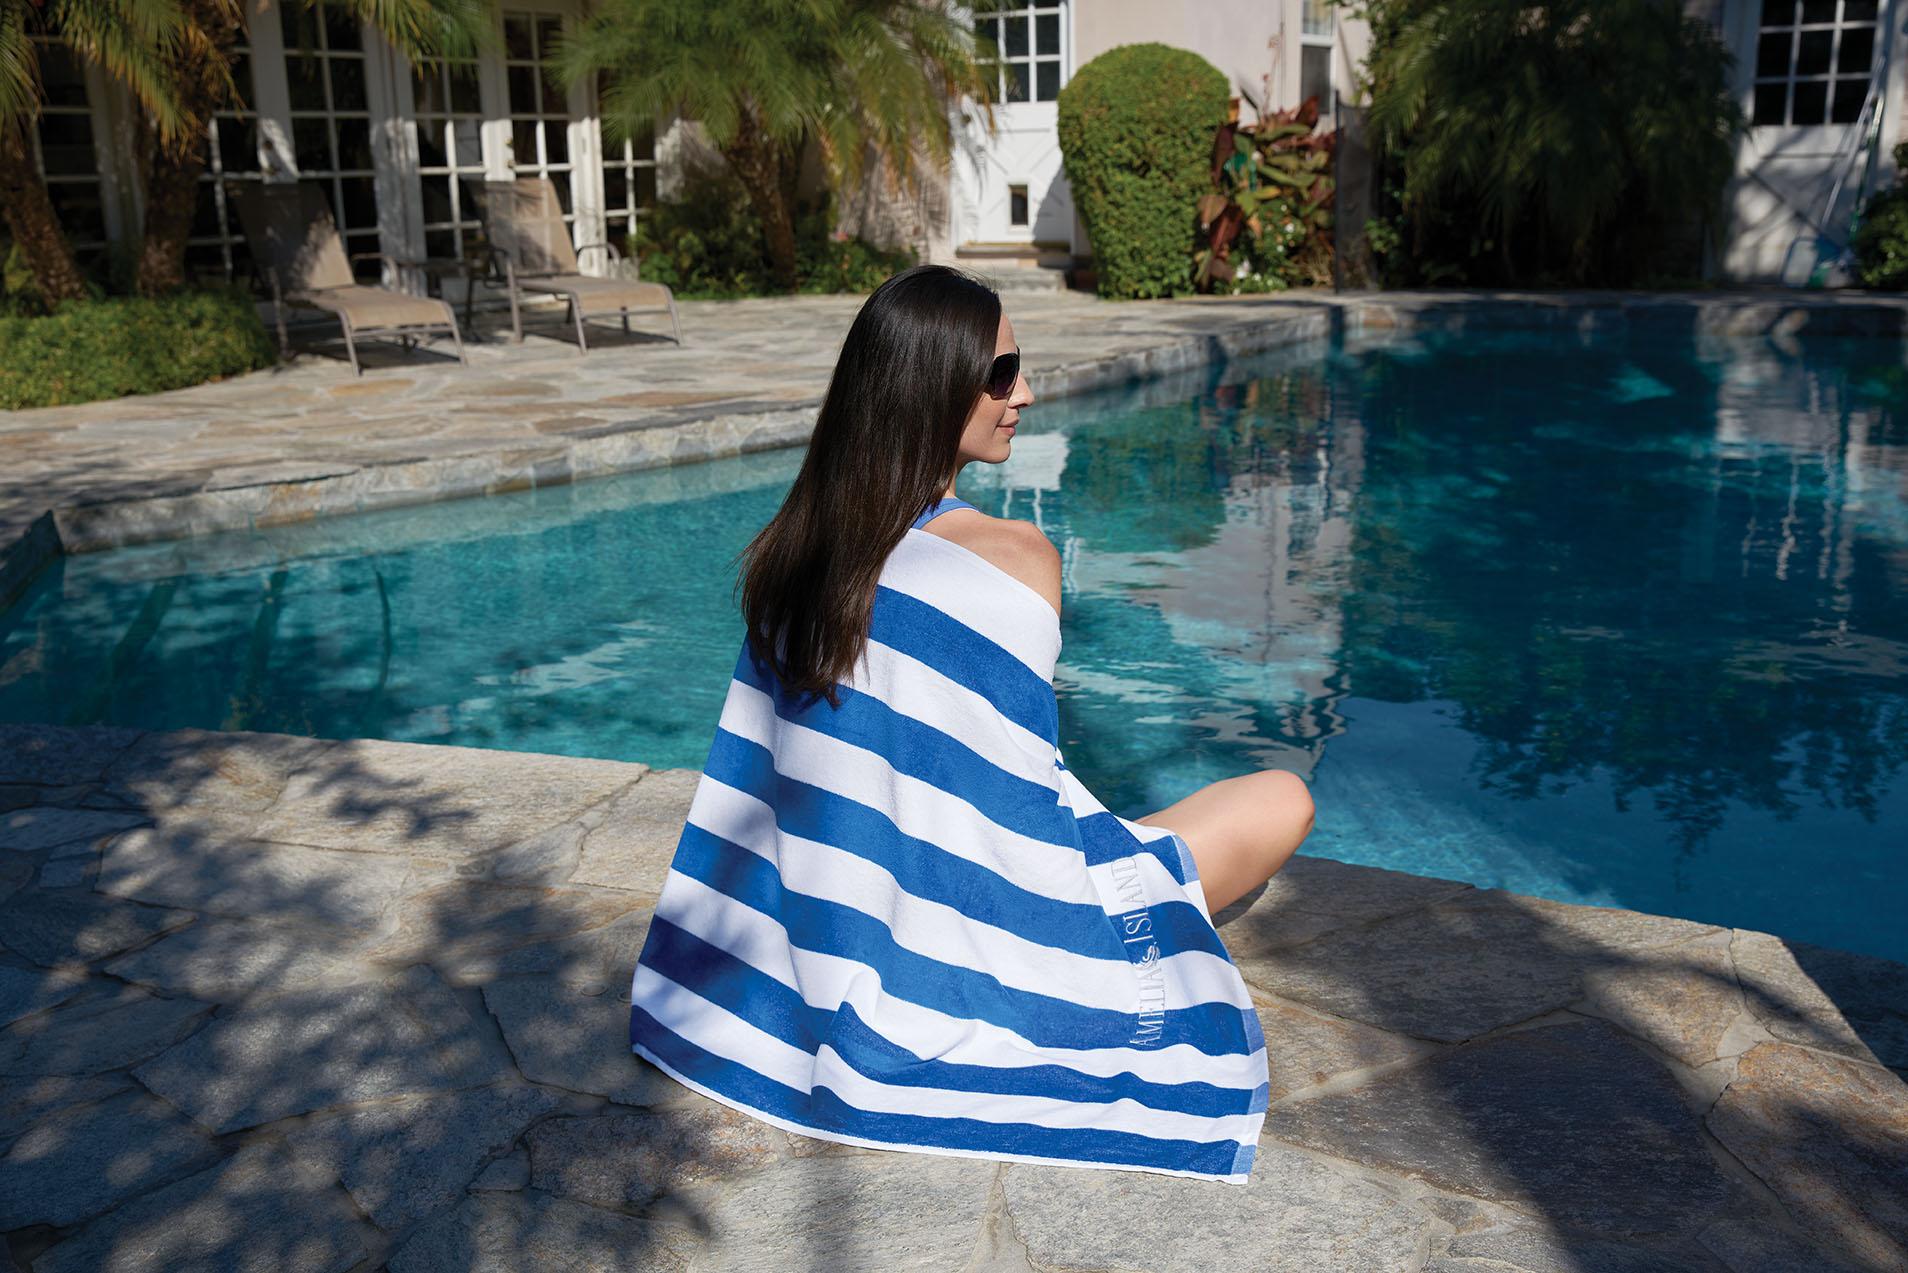 Cabana Striped Towels